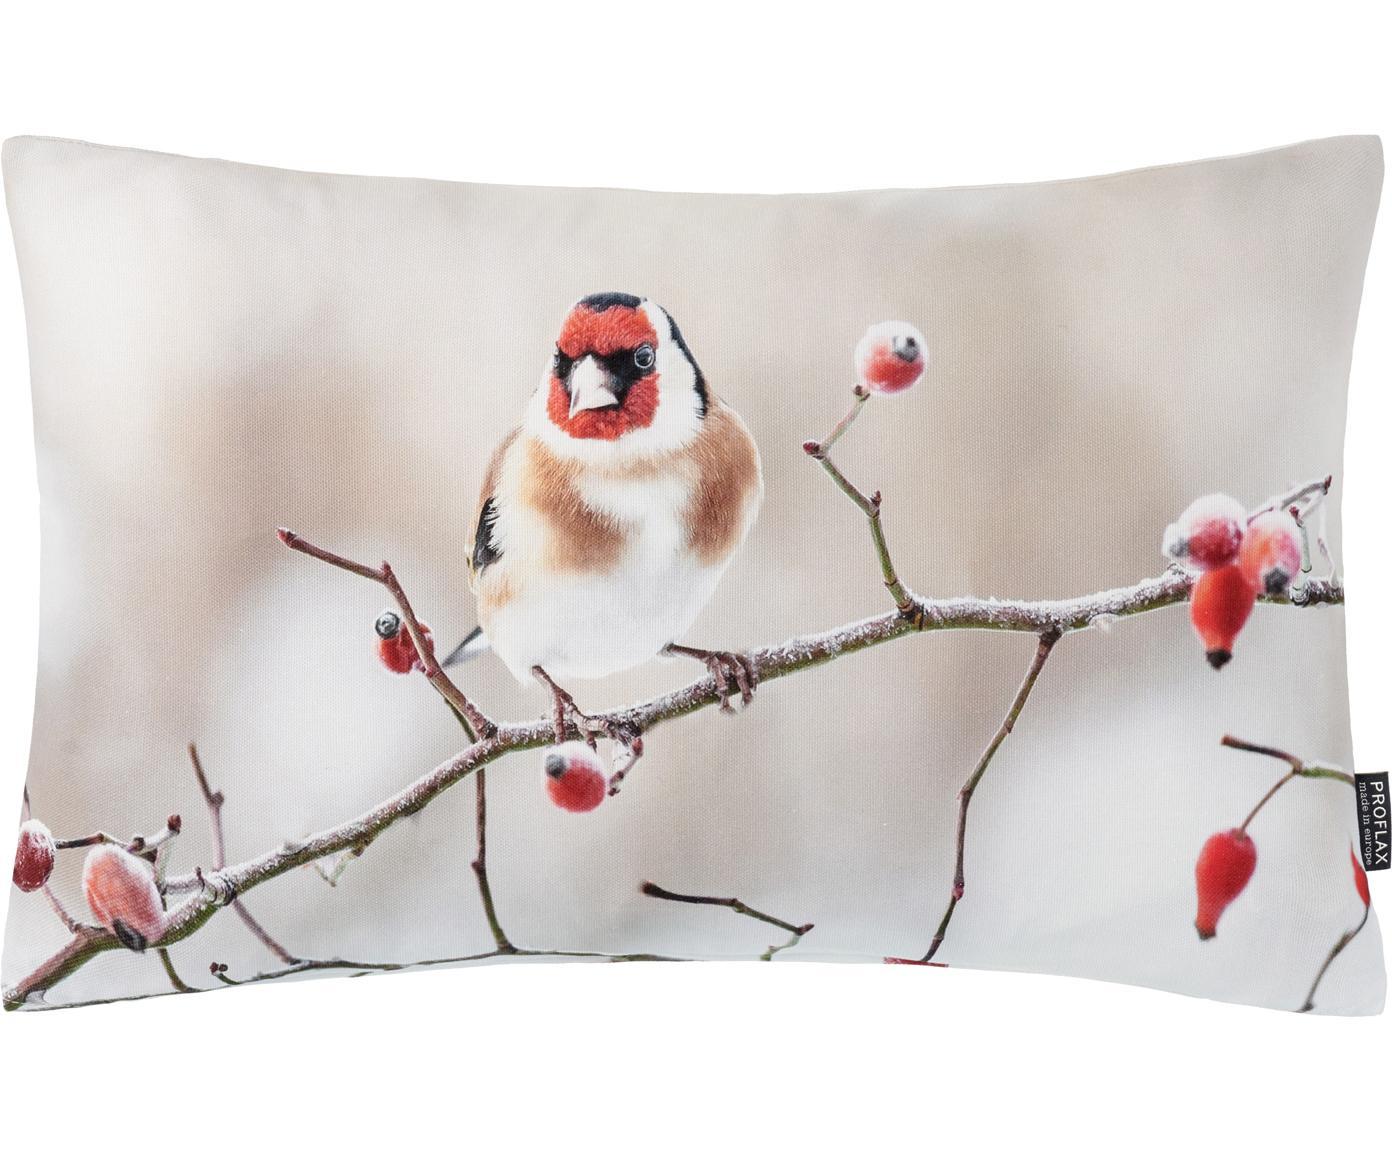 Kissenhülle Irmi, Baumwolle, Beigetöne, Rot, 30 x 50 cm